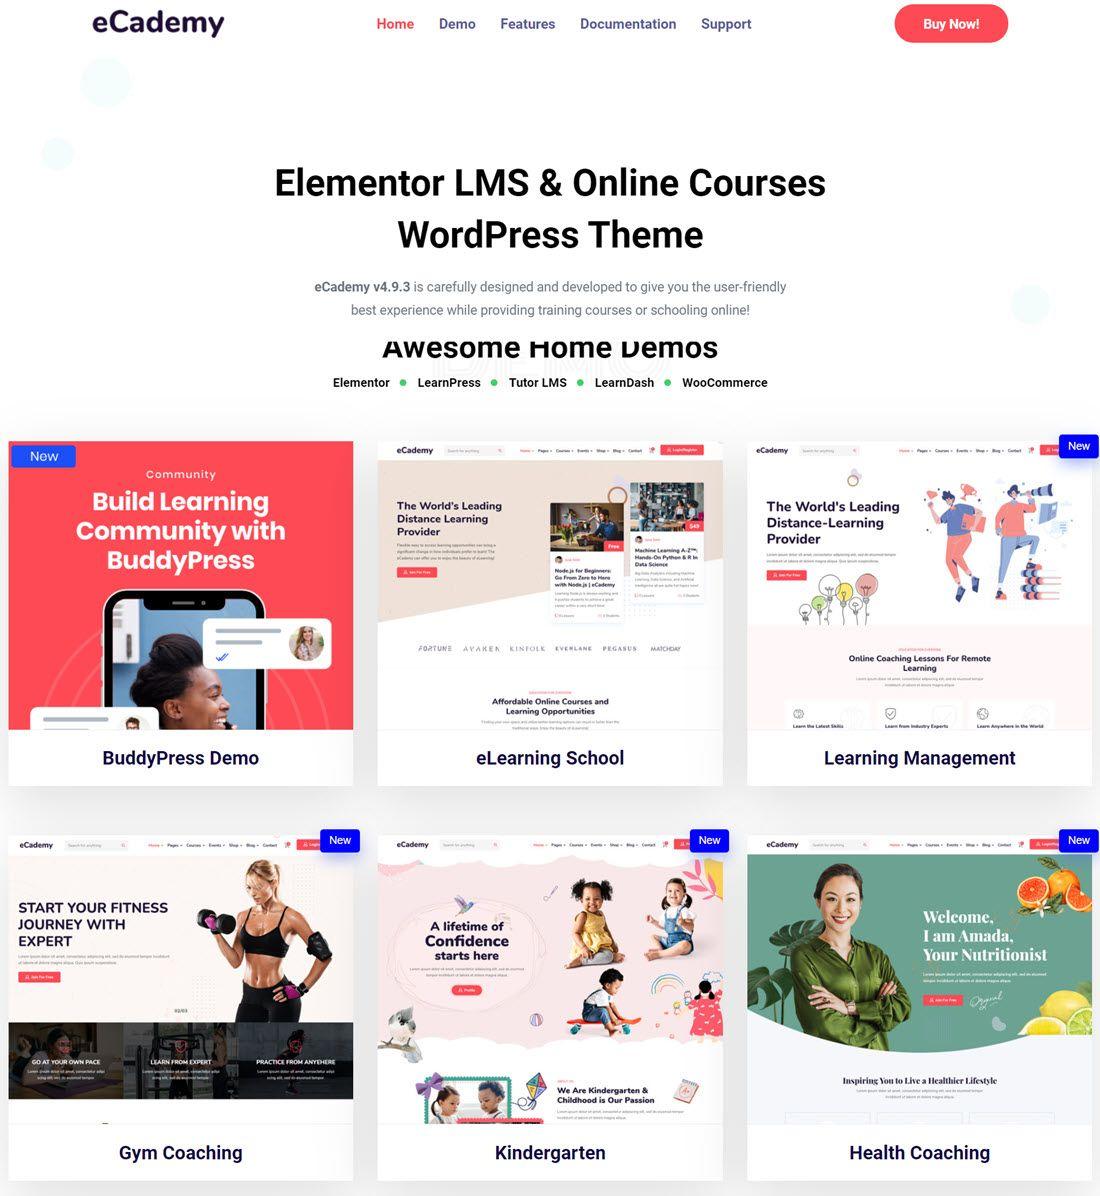 eCademy Elementor LMS, Online Courses & Training Education Theme